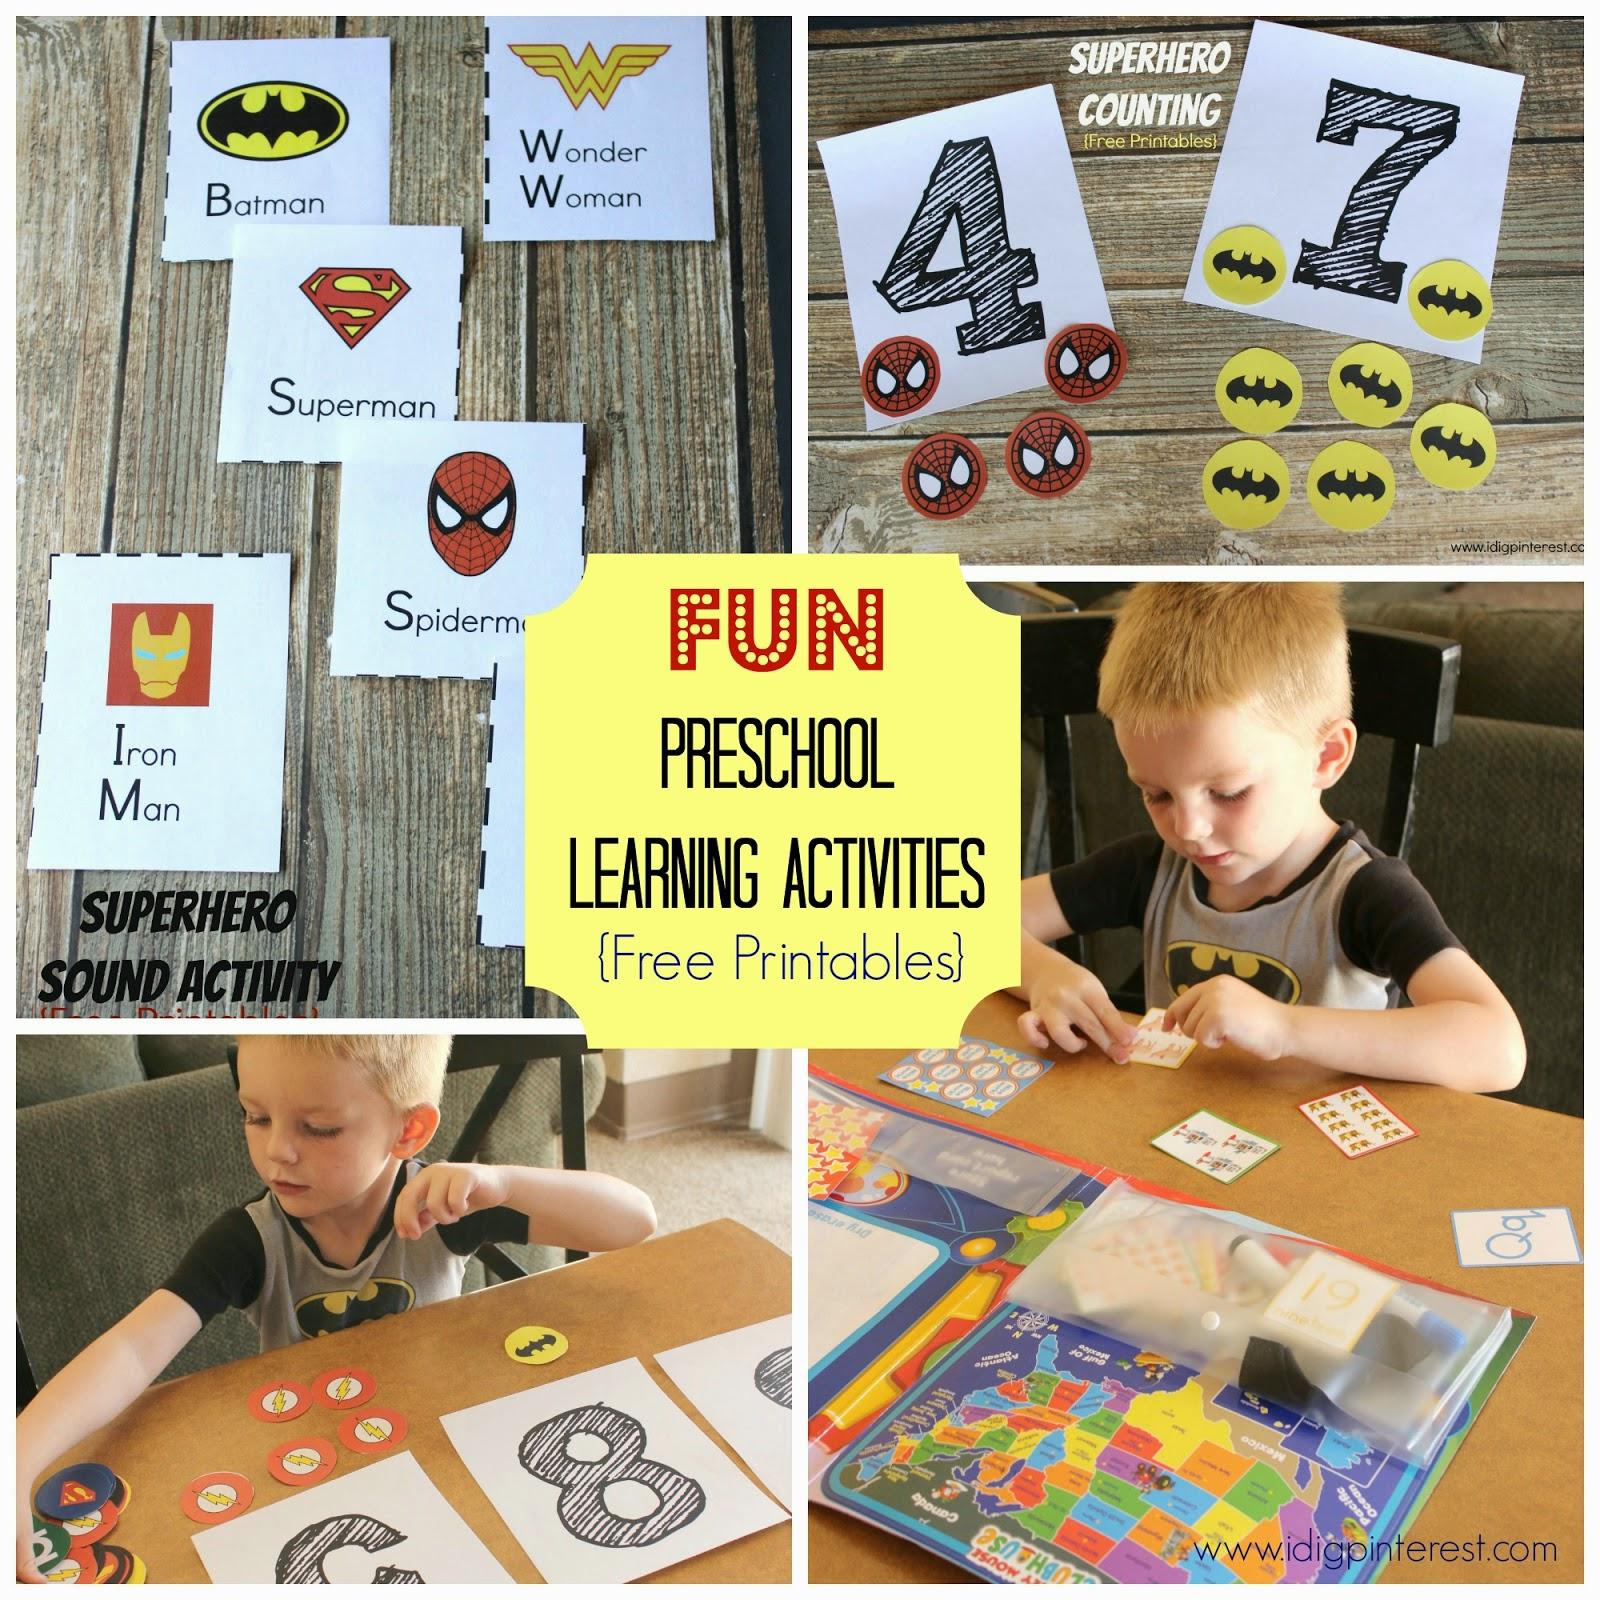 Make Learning Fun with Disney Jr., Preschool Superhero ...